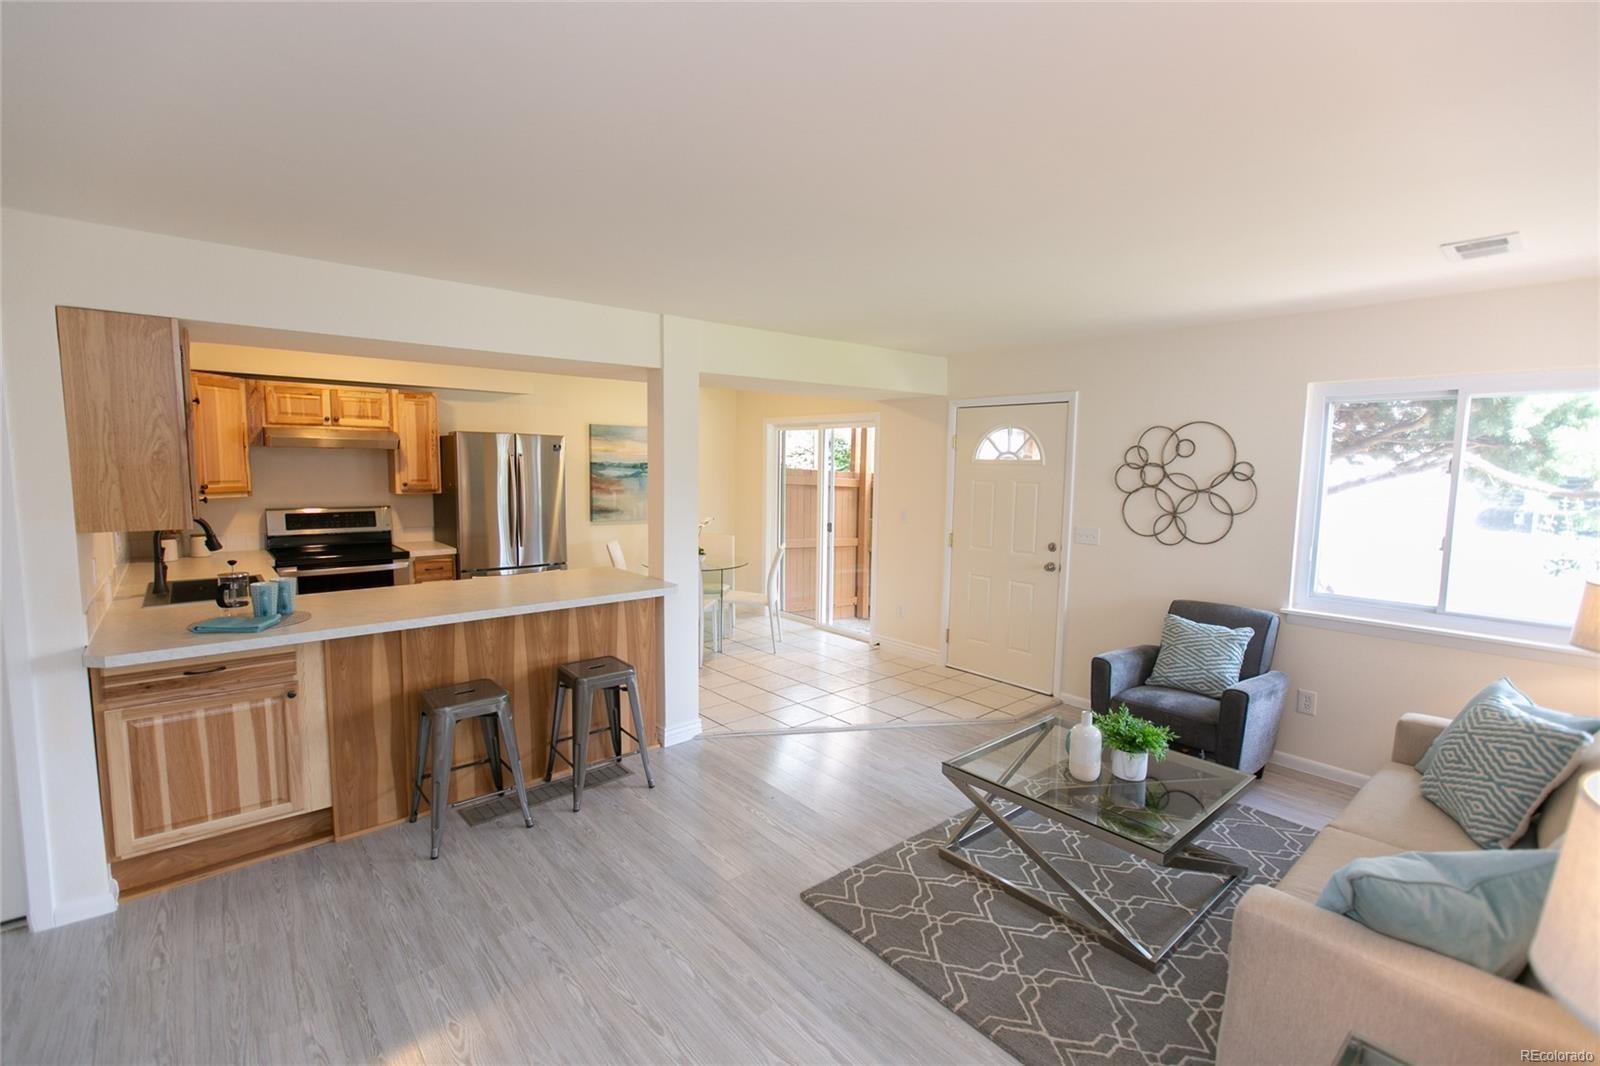 MLS# 4292489 - 1 - 3630 Iris Avenue #B, Boulder, CO 80301